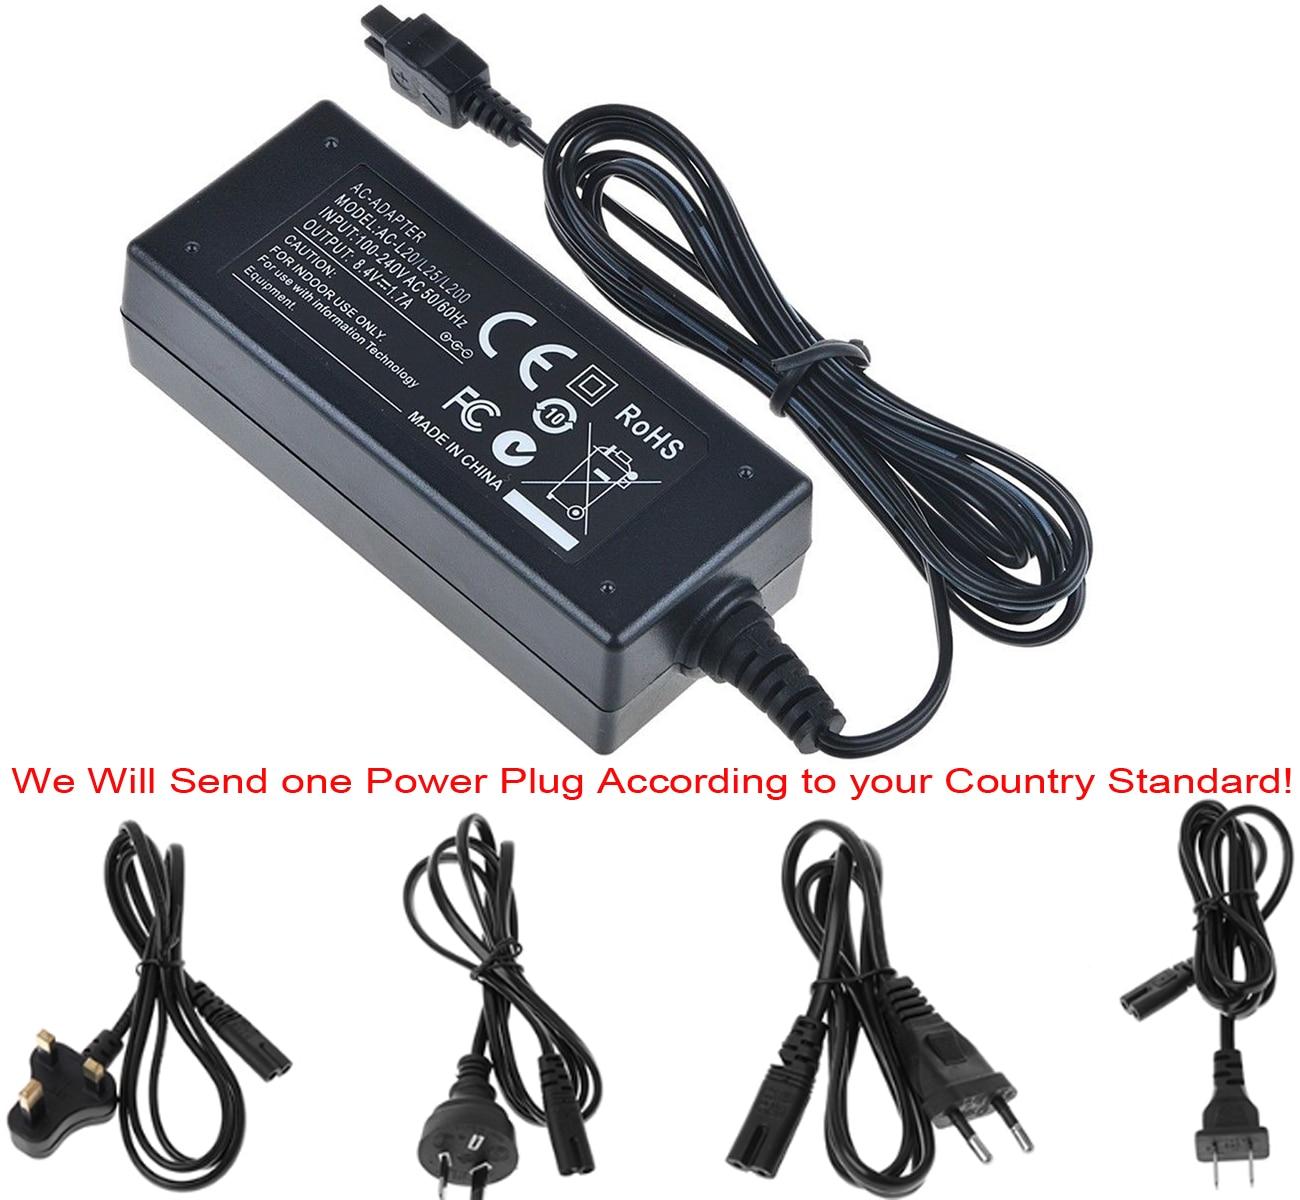 AC Cargador/adaptador de corriente para Sony DCR-HC51E... DCR-HC52E... DCR-HC53E... DCR-HC54E... DCR-HC62E... DCR-HC65E... DCR-HC85E Cámaras grabadoras Handycam